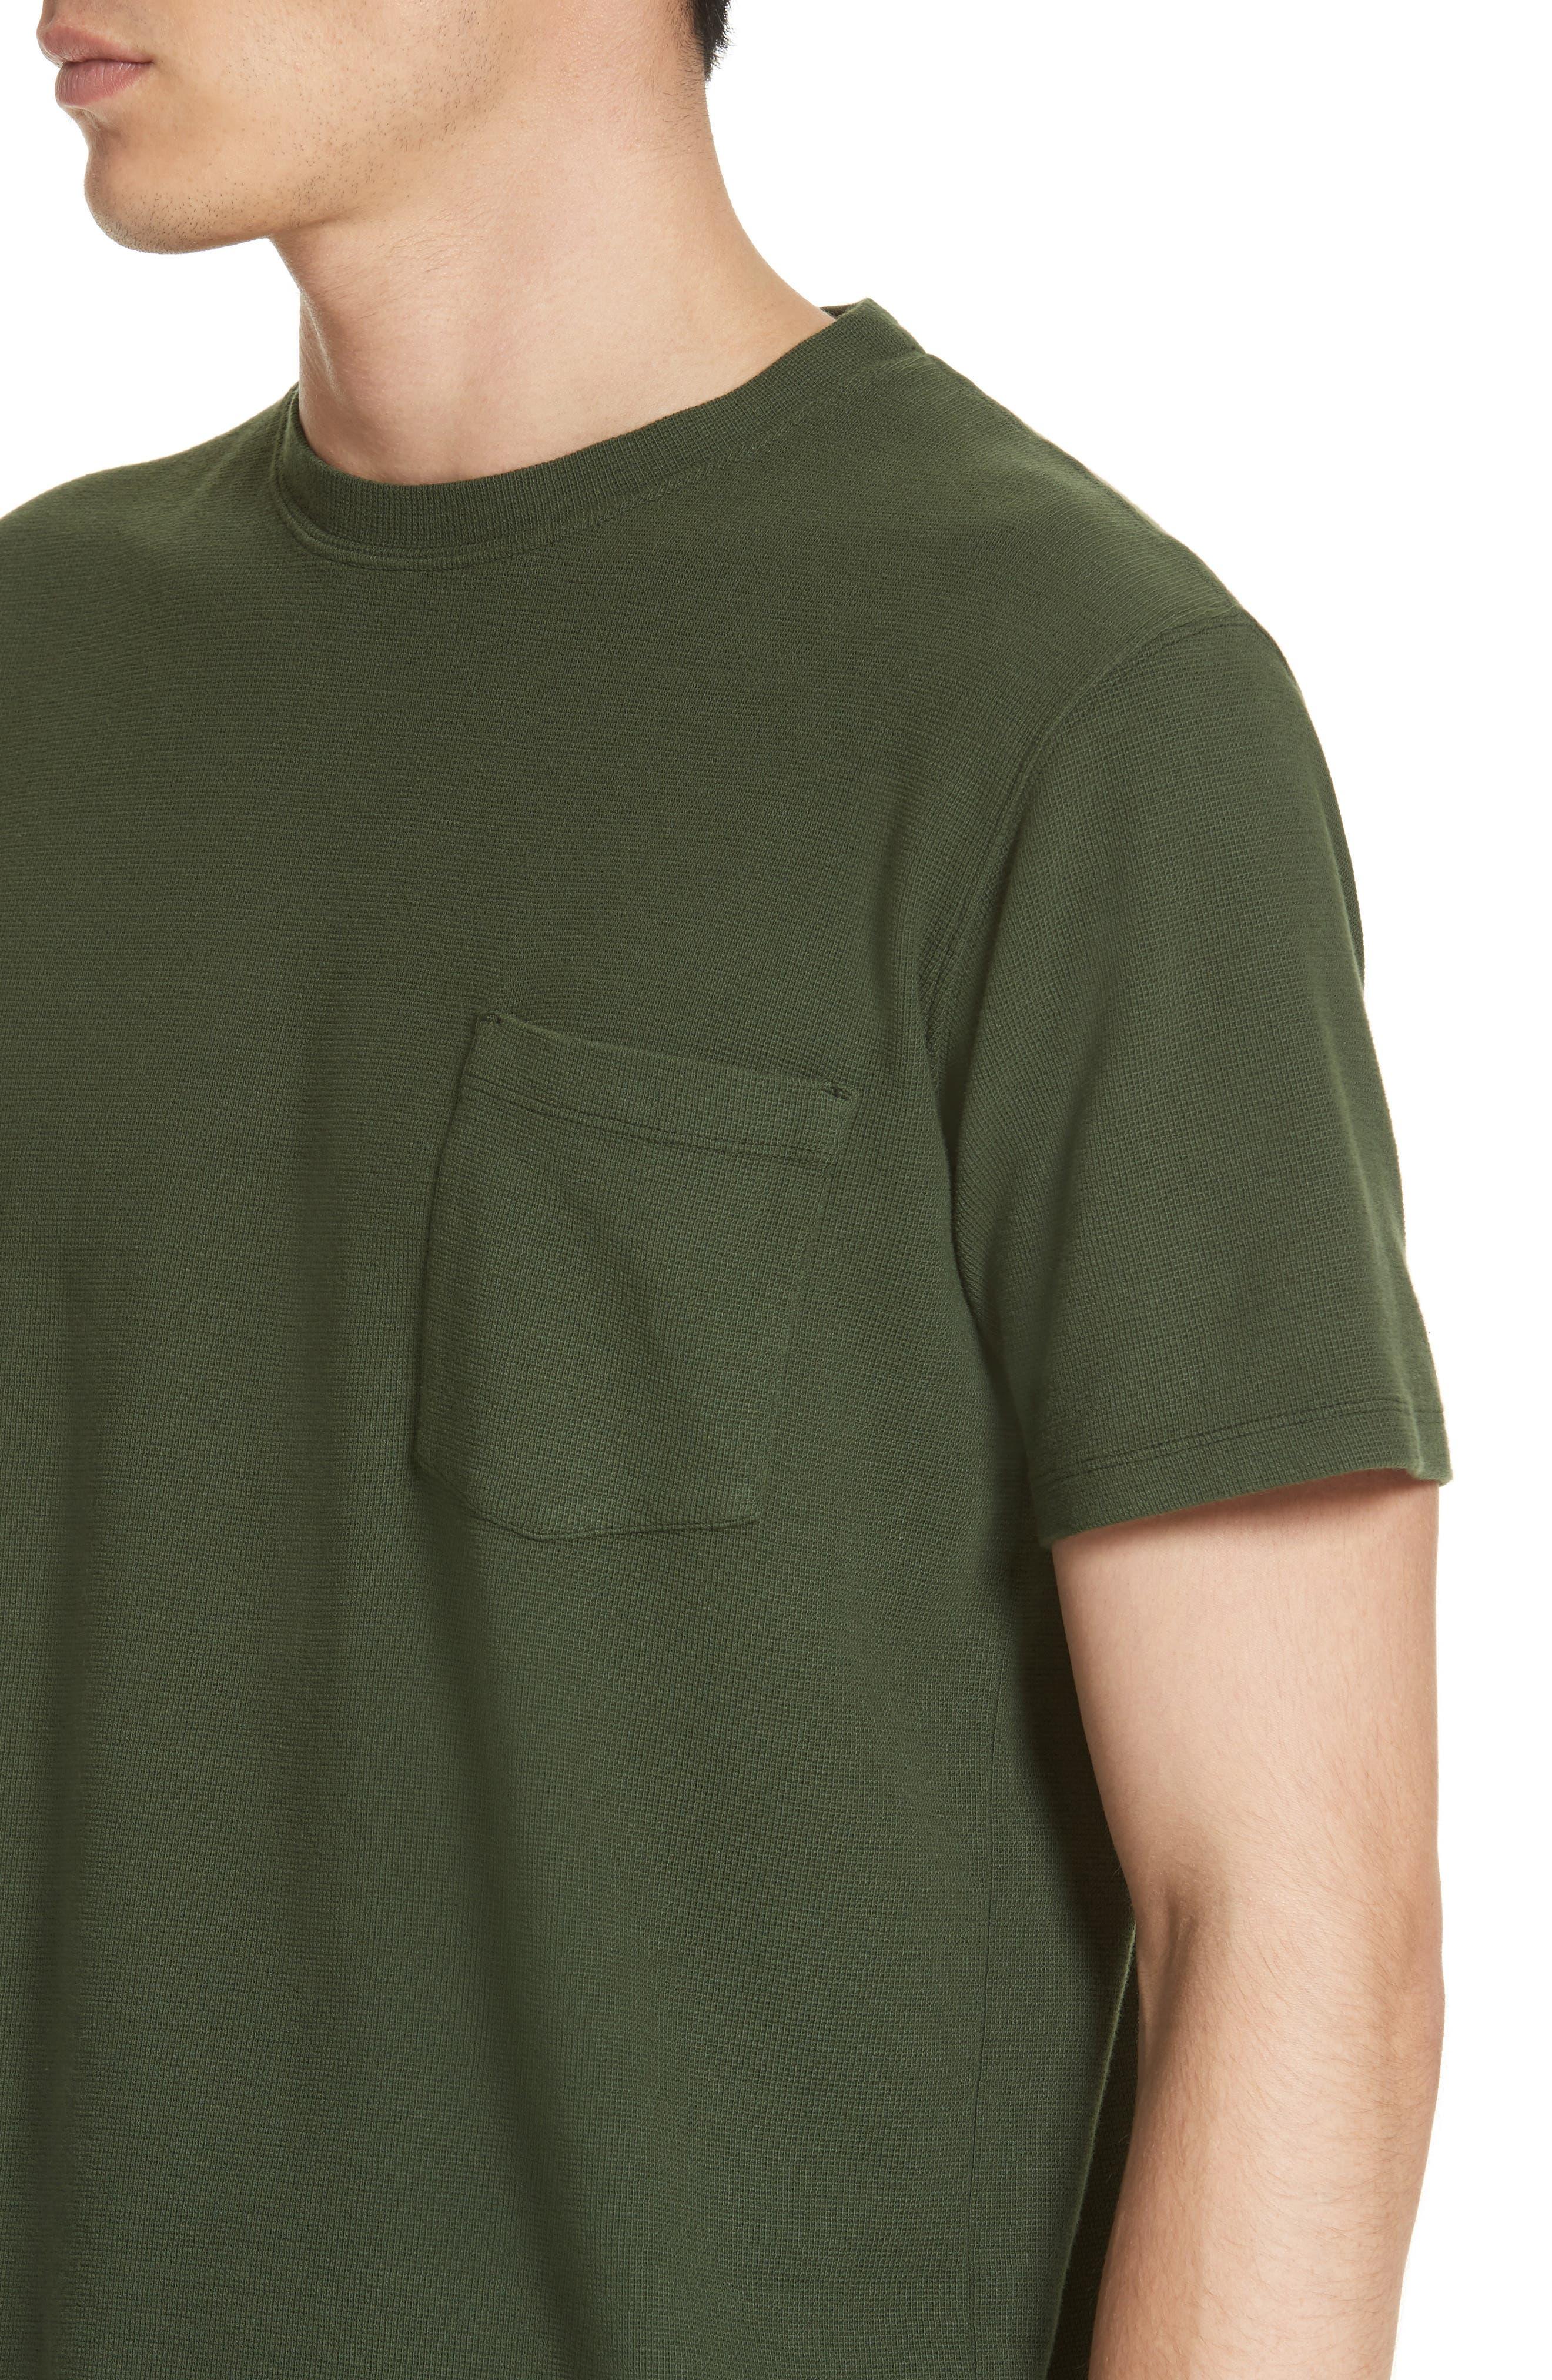 Niels Garment Dye T-Shirt,                             Alternate thumbnail 4, color,